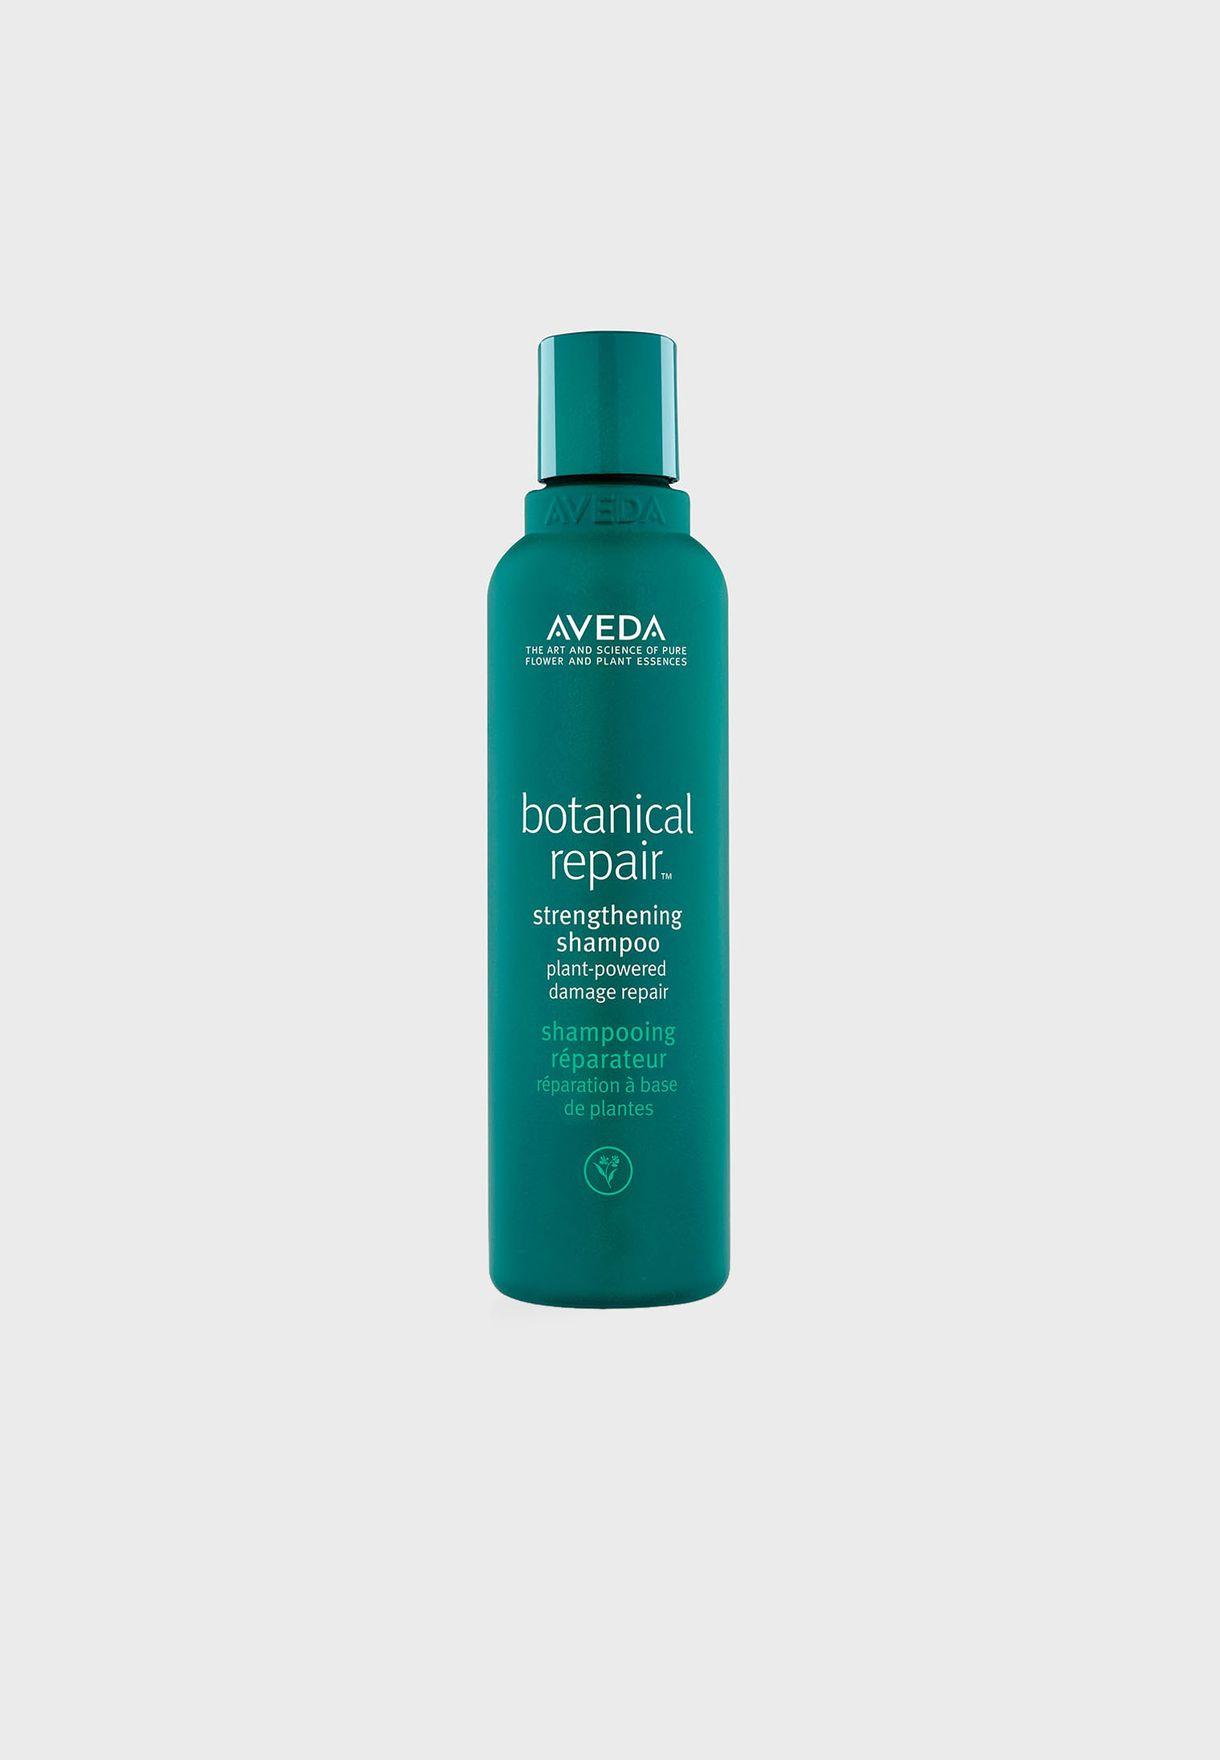 Botanical Repair Strengthening Shampoo 200ml